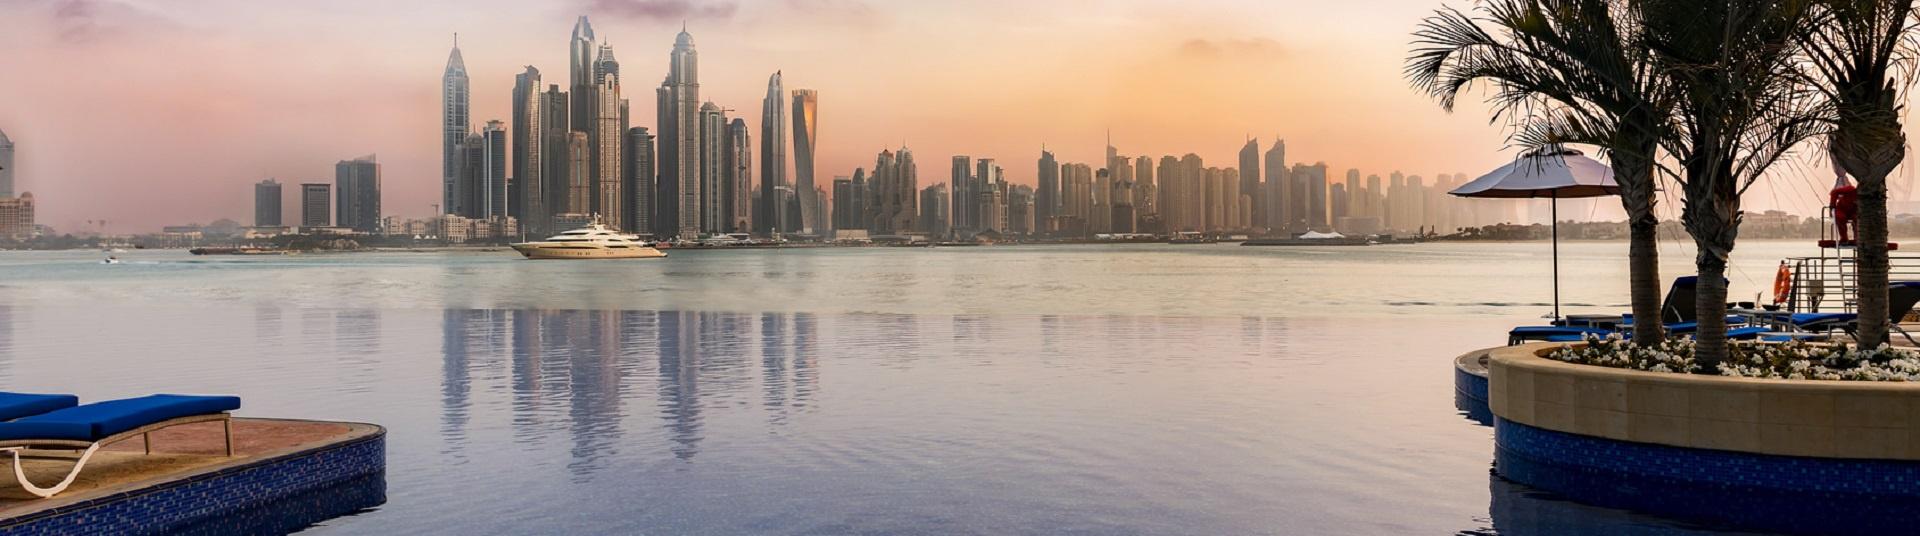 Week-end pas cher Dubai